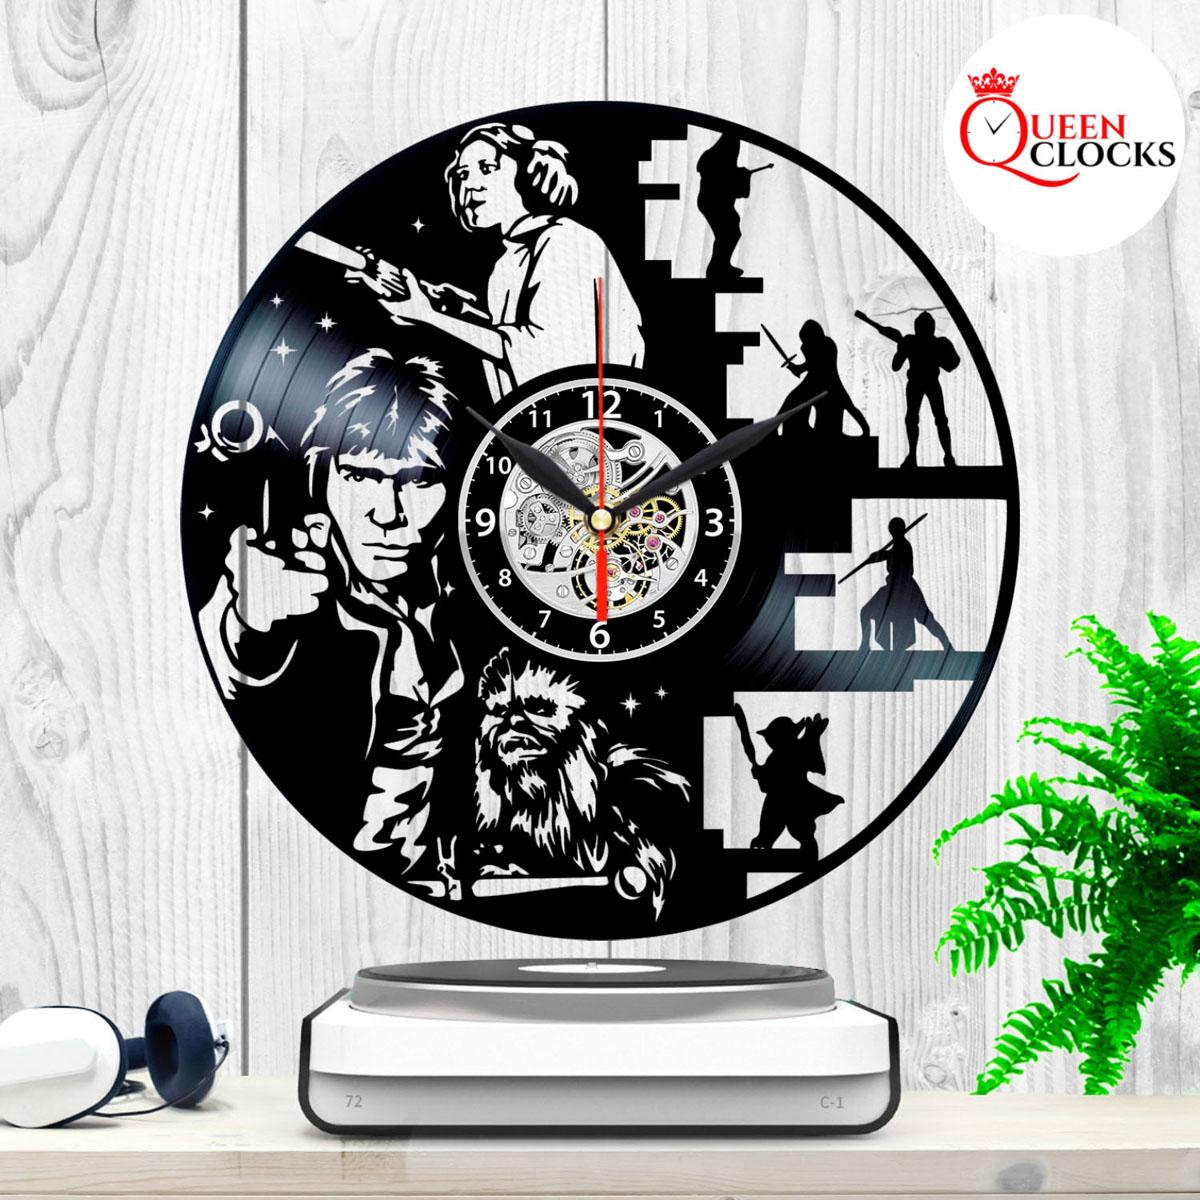 Star Wars Death Star Han Solo Leia Vinyl Record Wall Clock Best Gift Home Decor